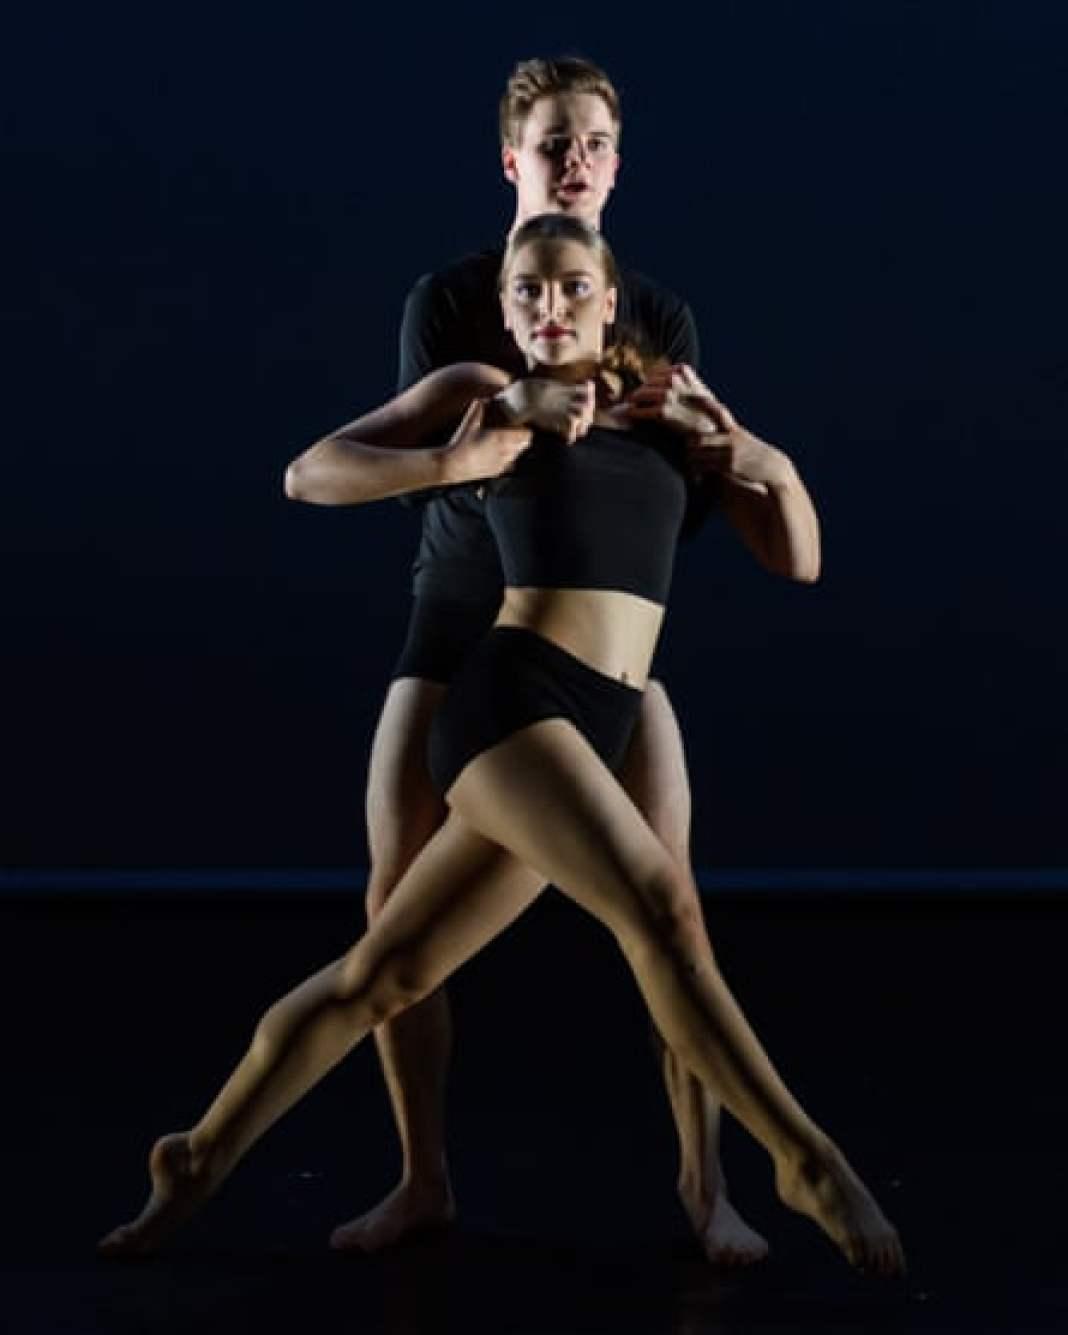 Synergy, performed by Elmhurst Ballet Company last February